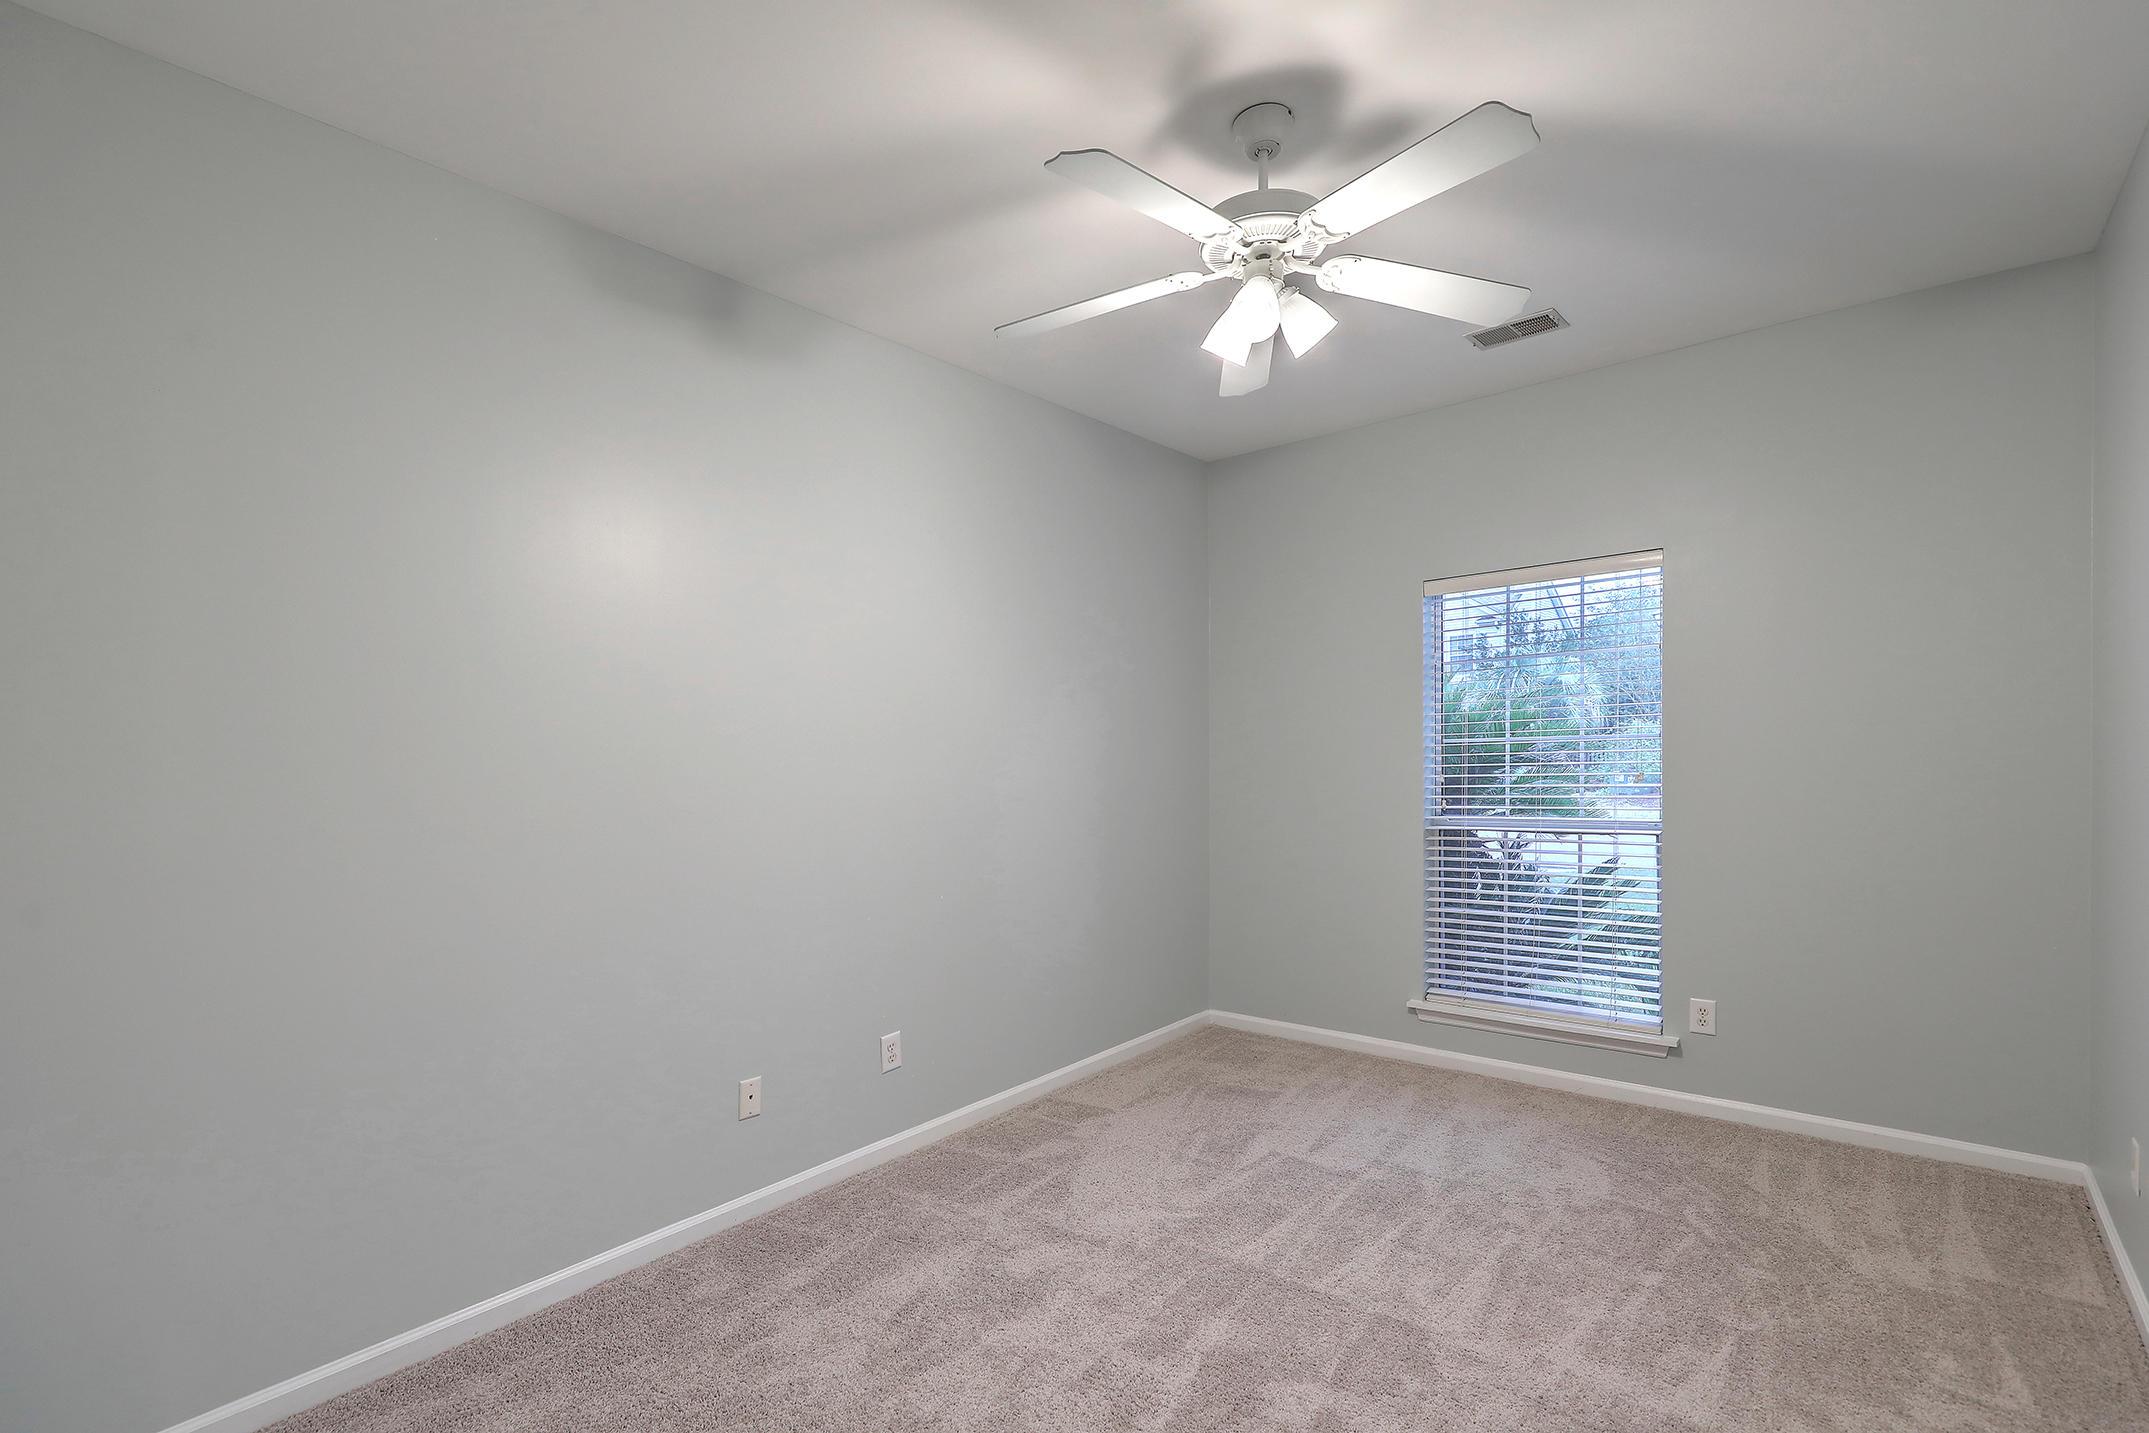 Dunes West Homes For Sale - 1309 Sassafrass, Mount Pleasant, SC - 21